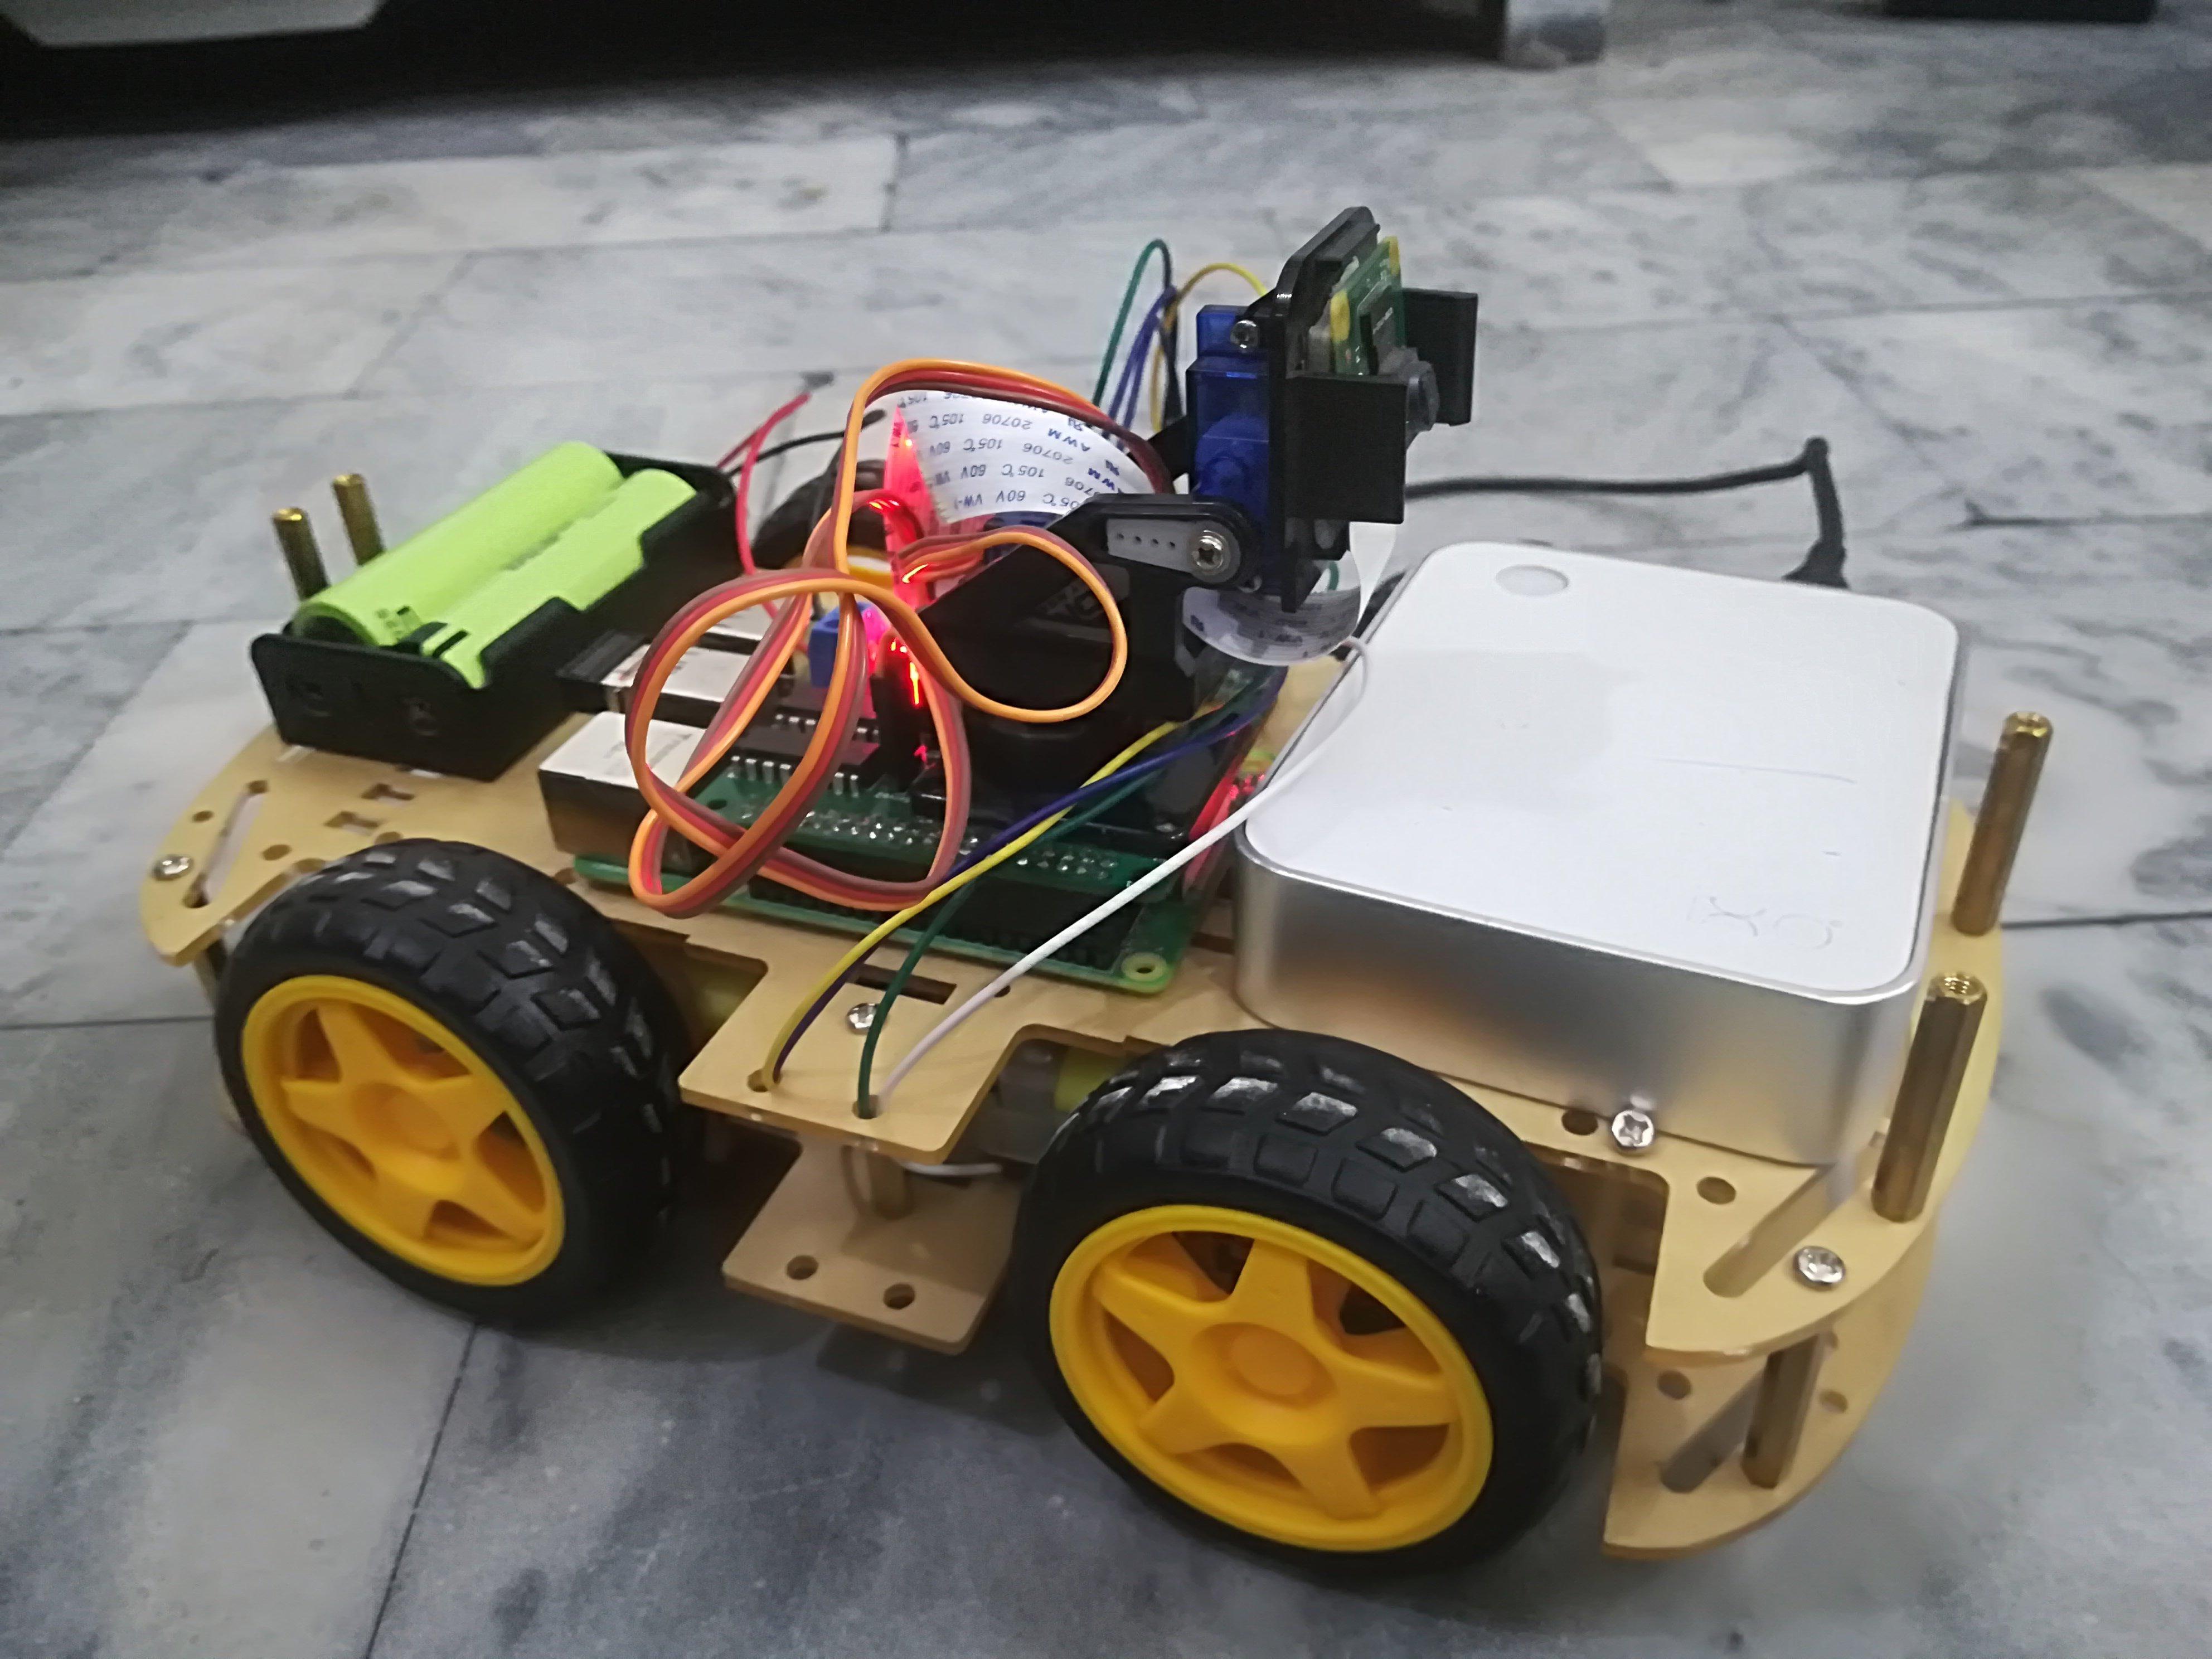 Wireless Video Surveillance Robot using Raspberry Pi 4.jpg